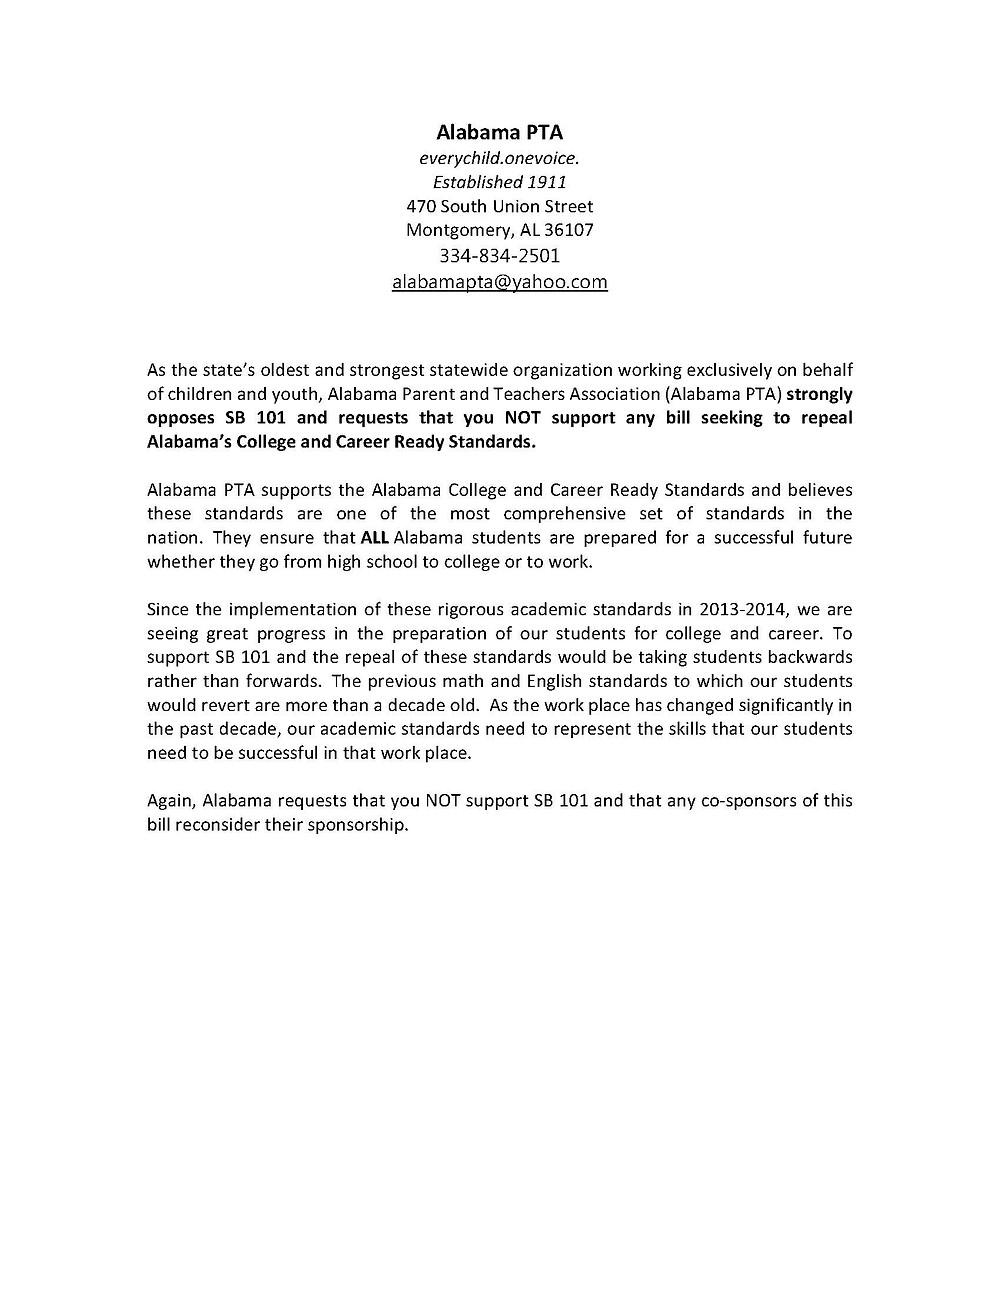 Alabama PTA Statement SB 101.jpg